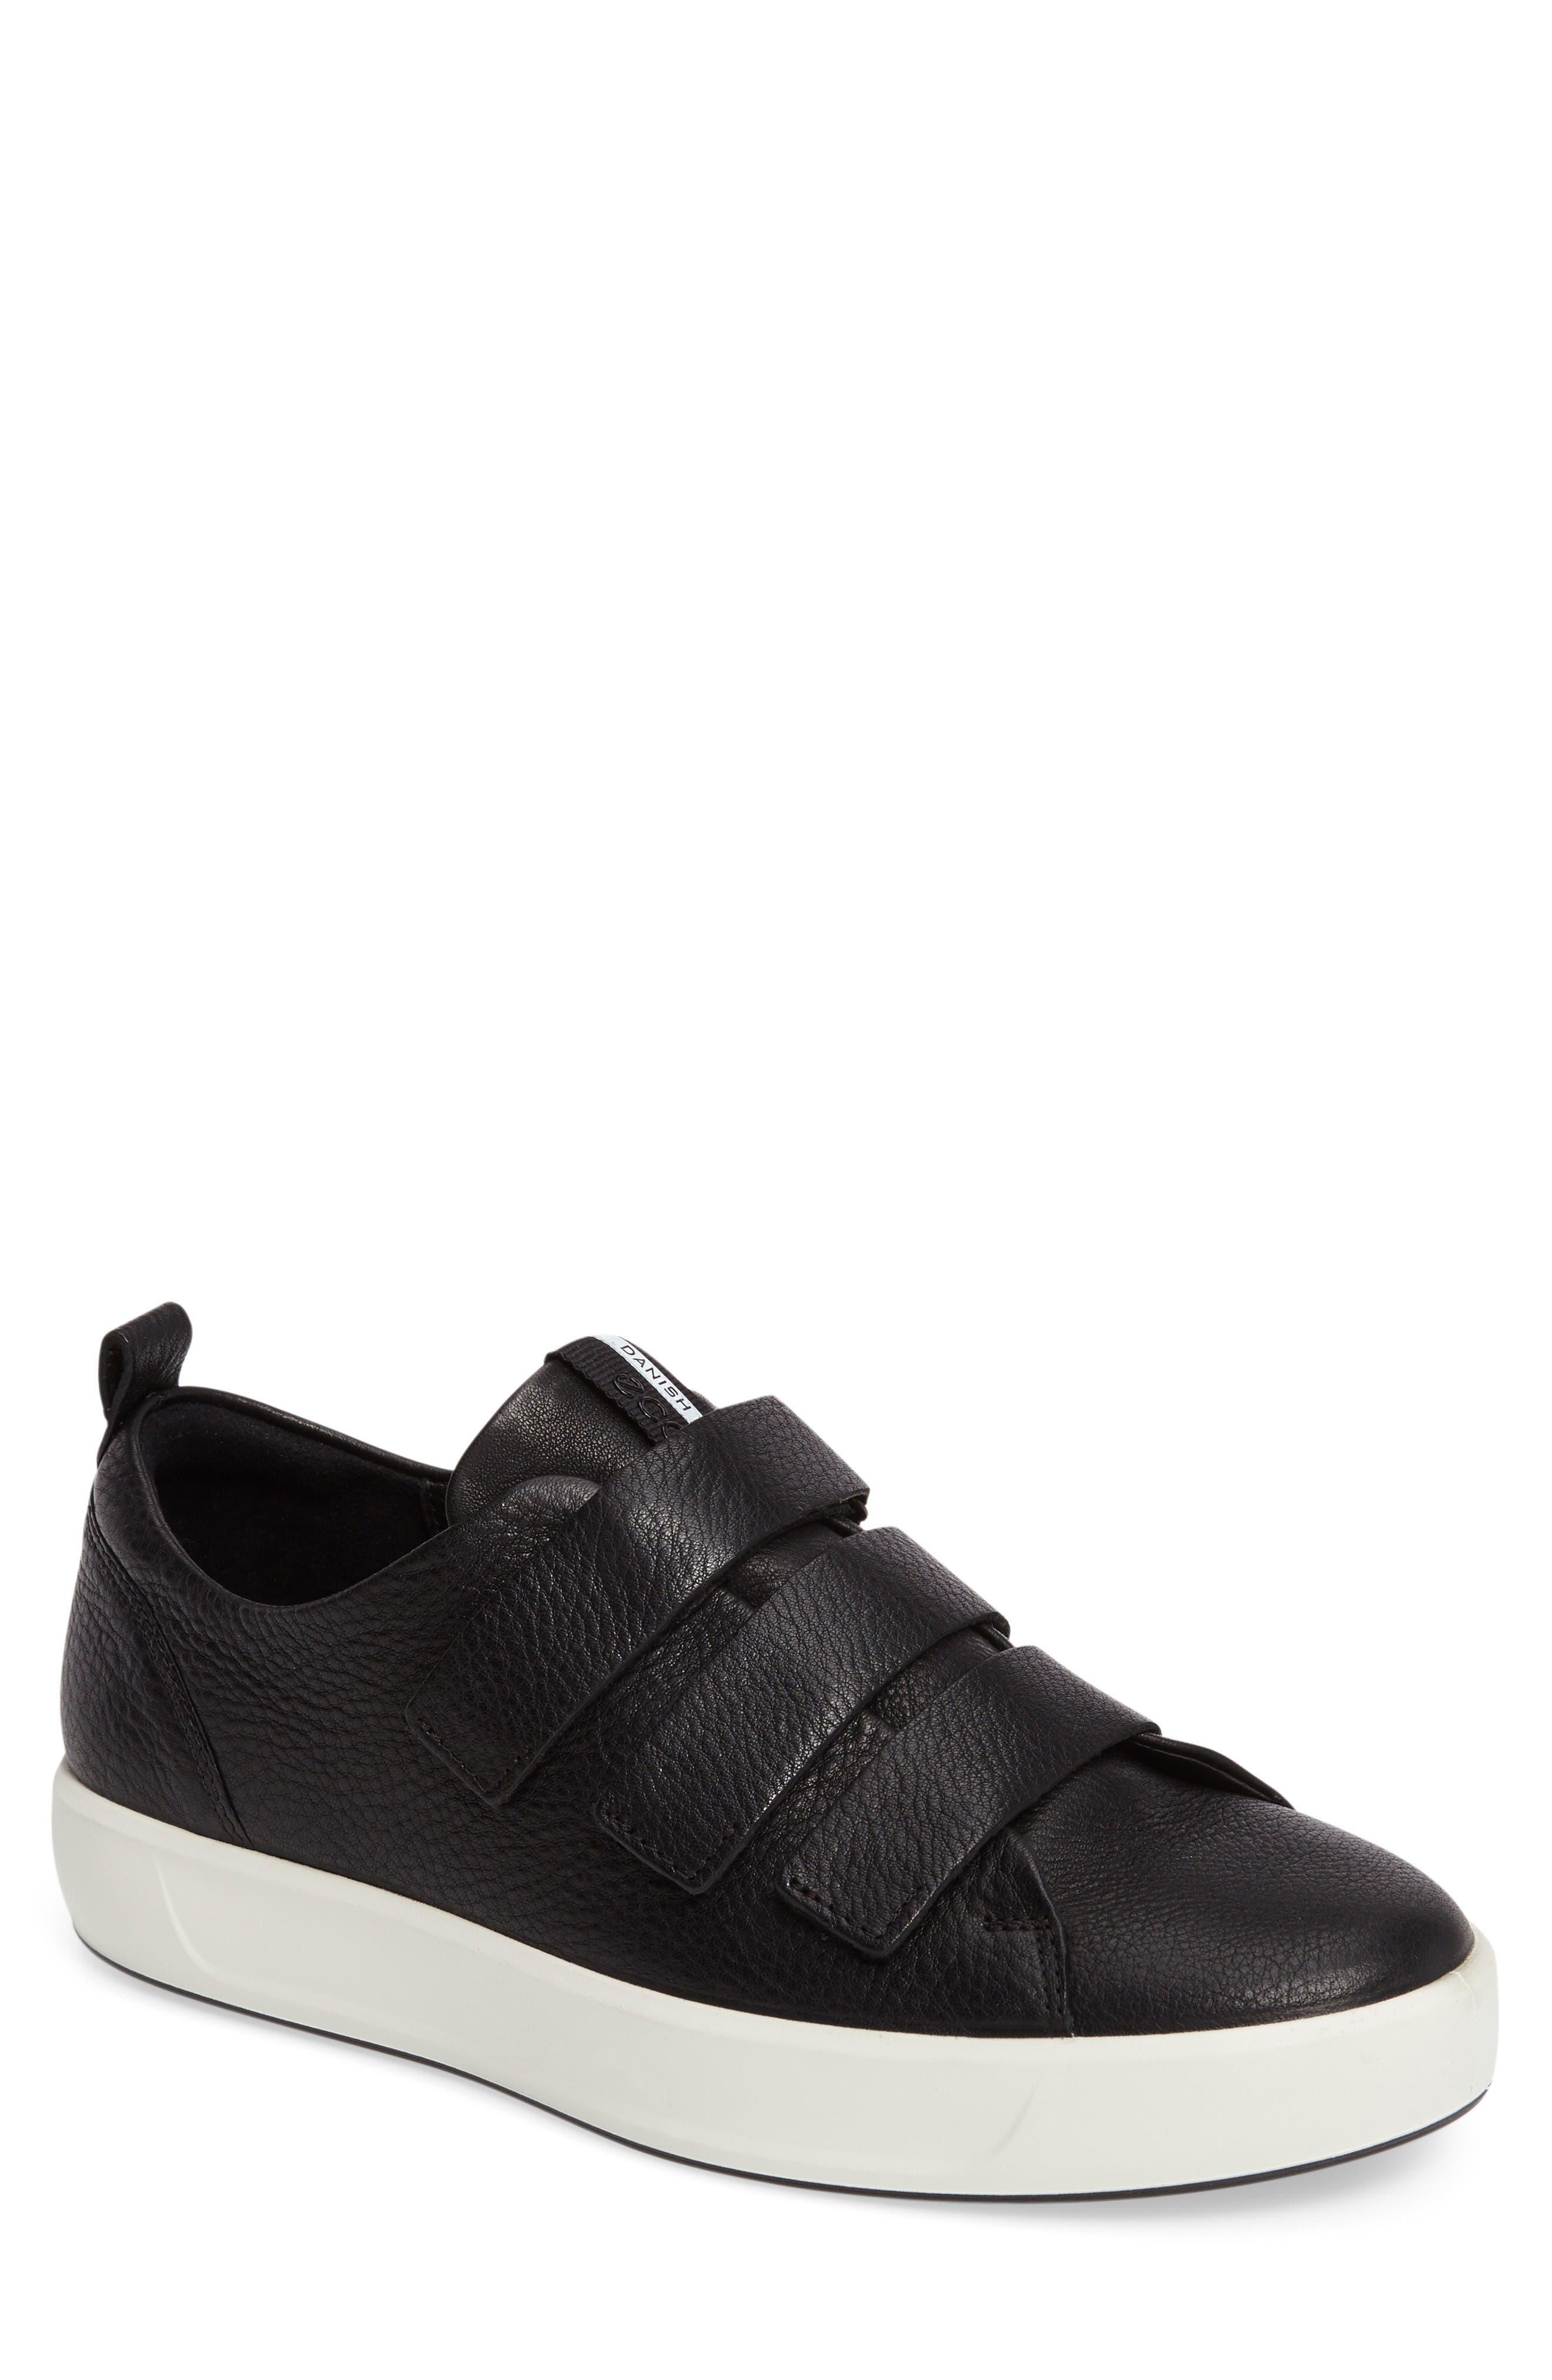 ECCO Soft 8 Strap Sneaker (Men)